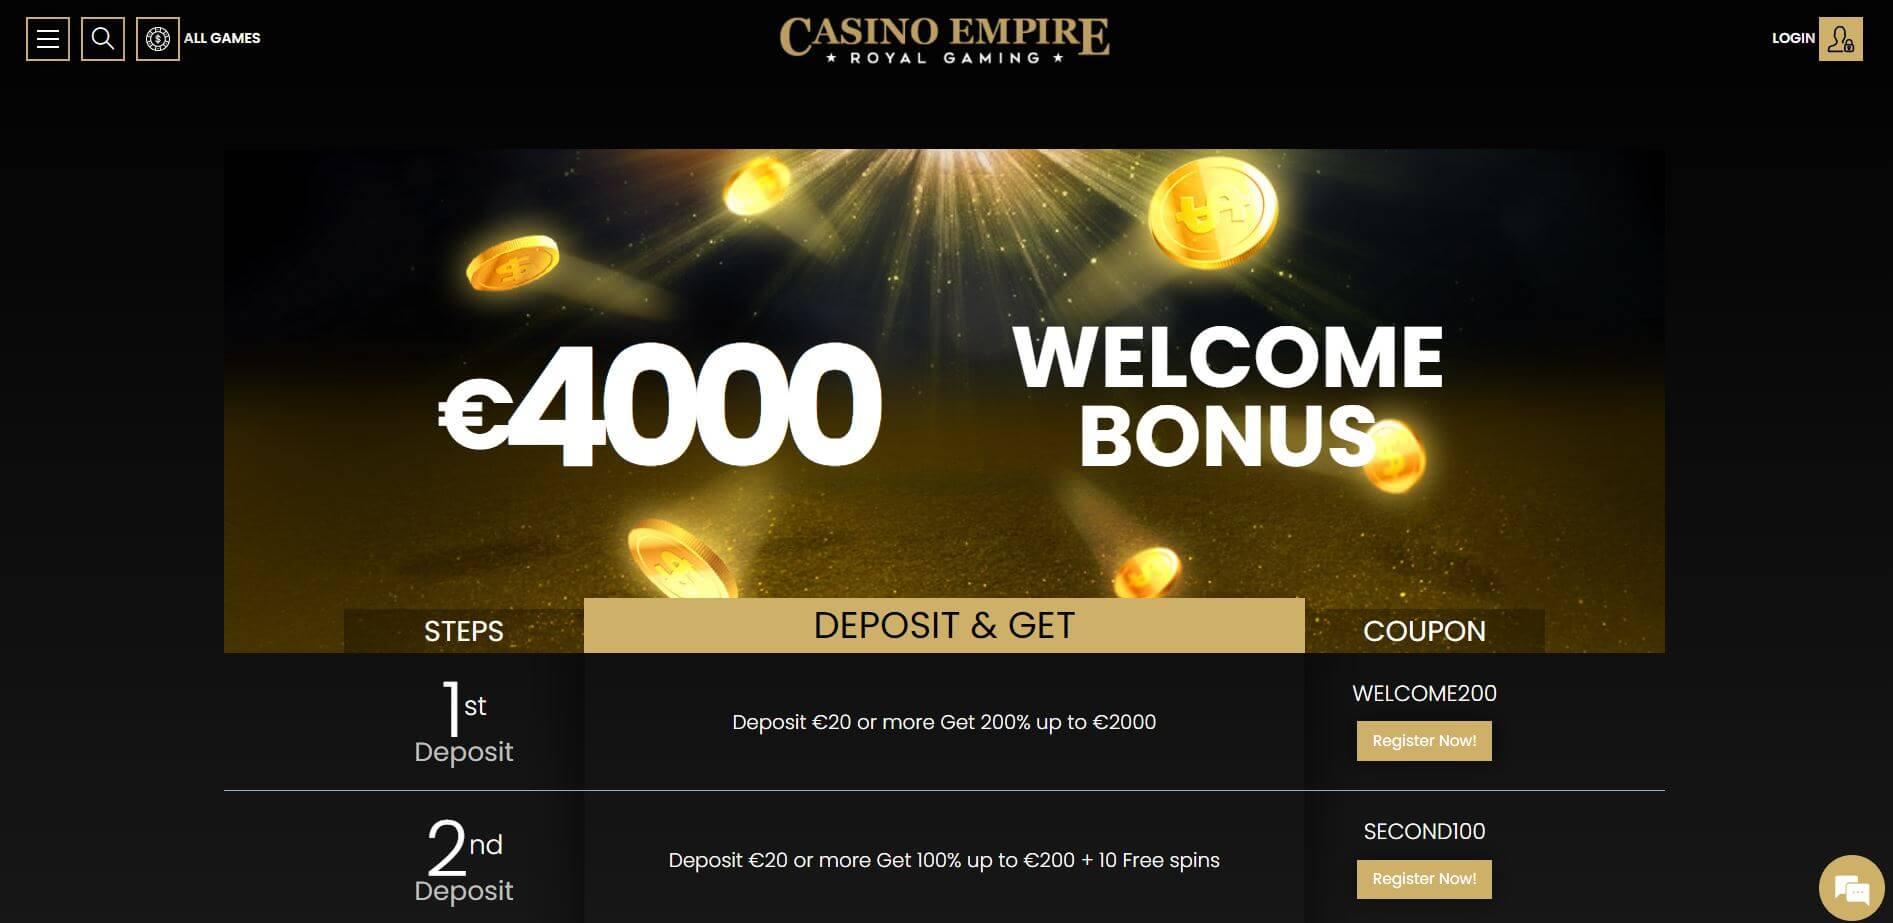 Casino Empire Promotions